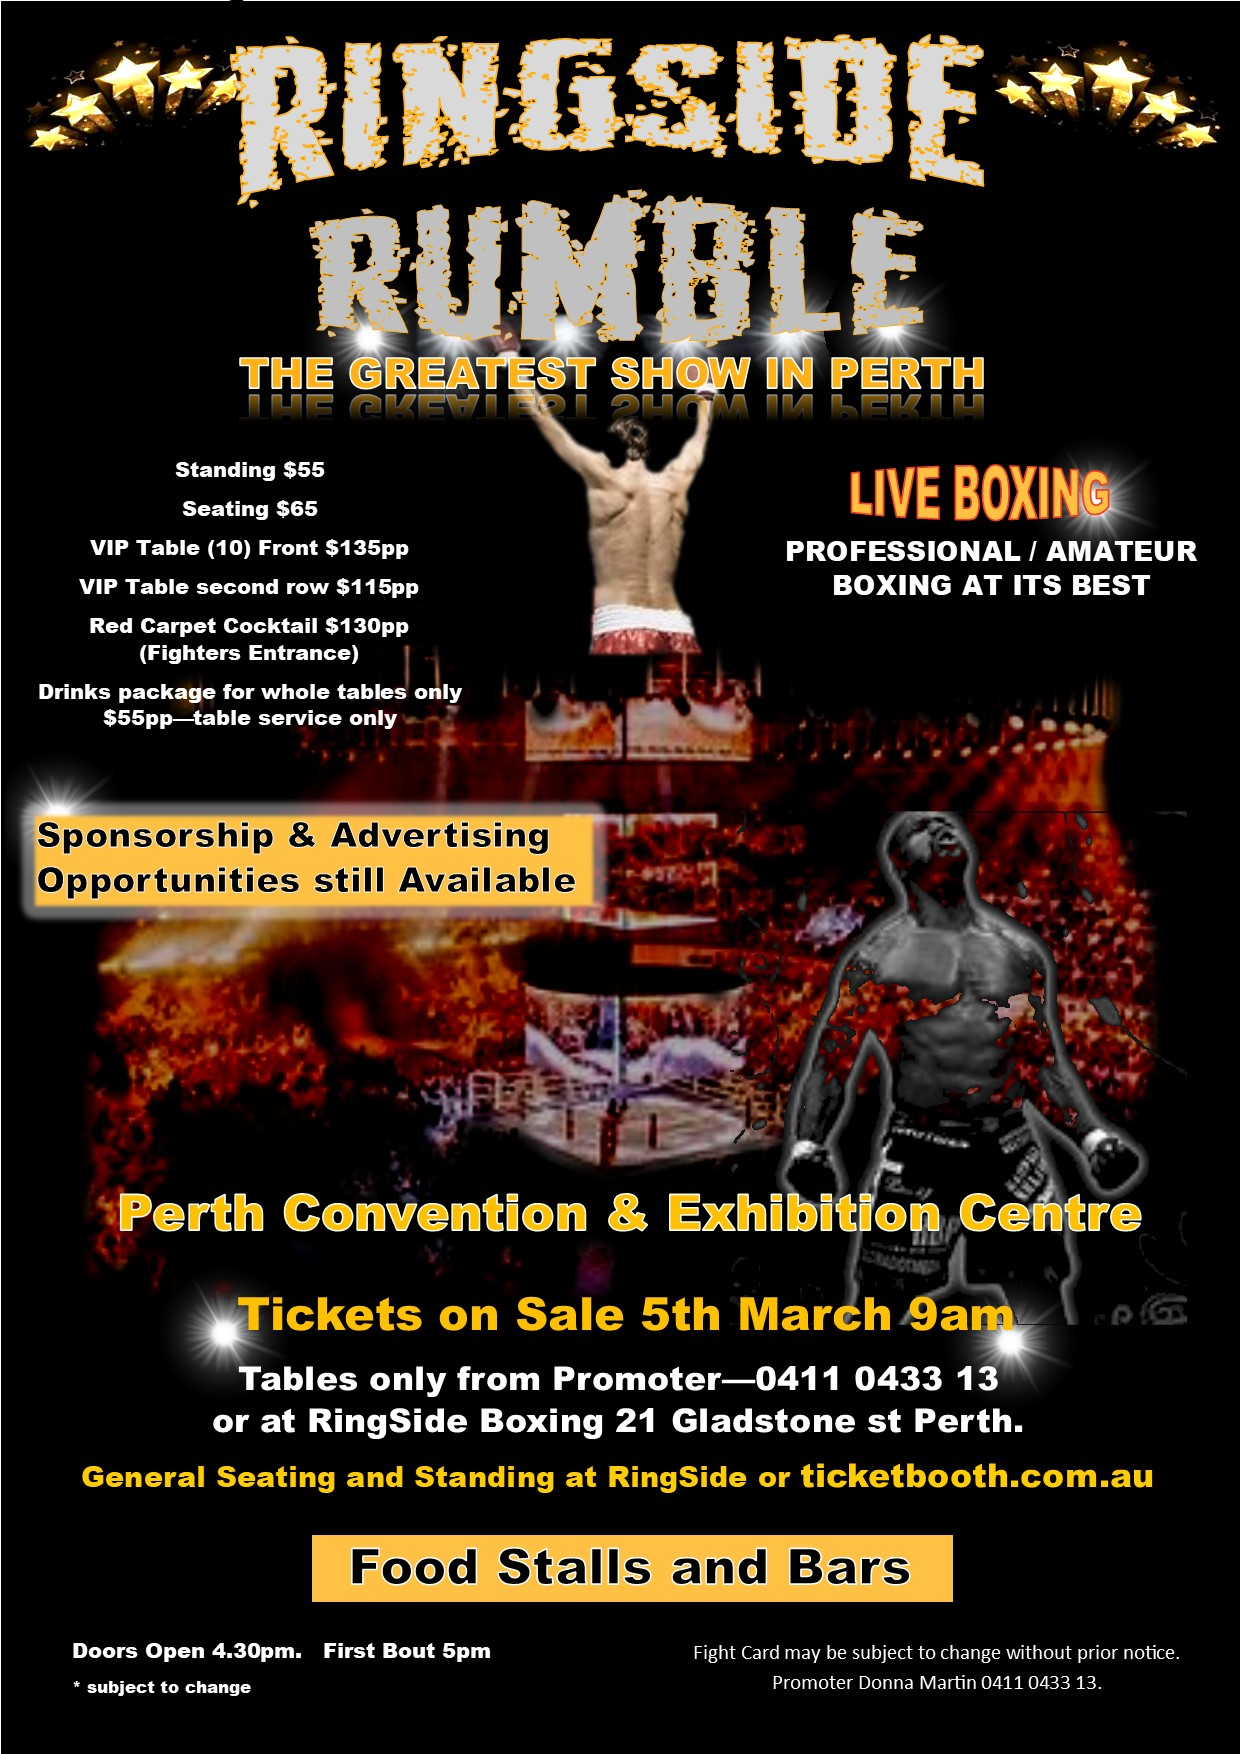 RingSide Rumble 2019